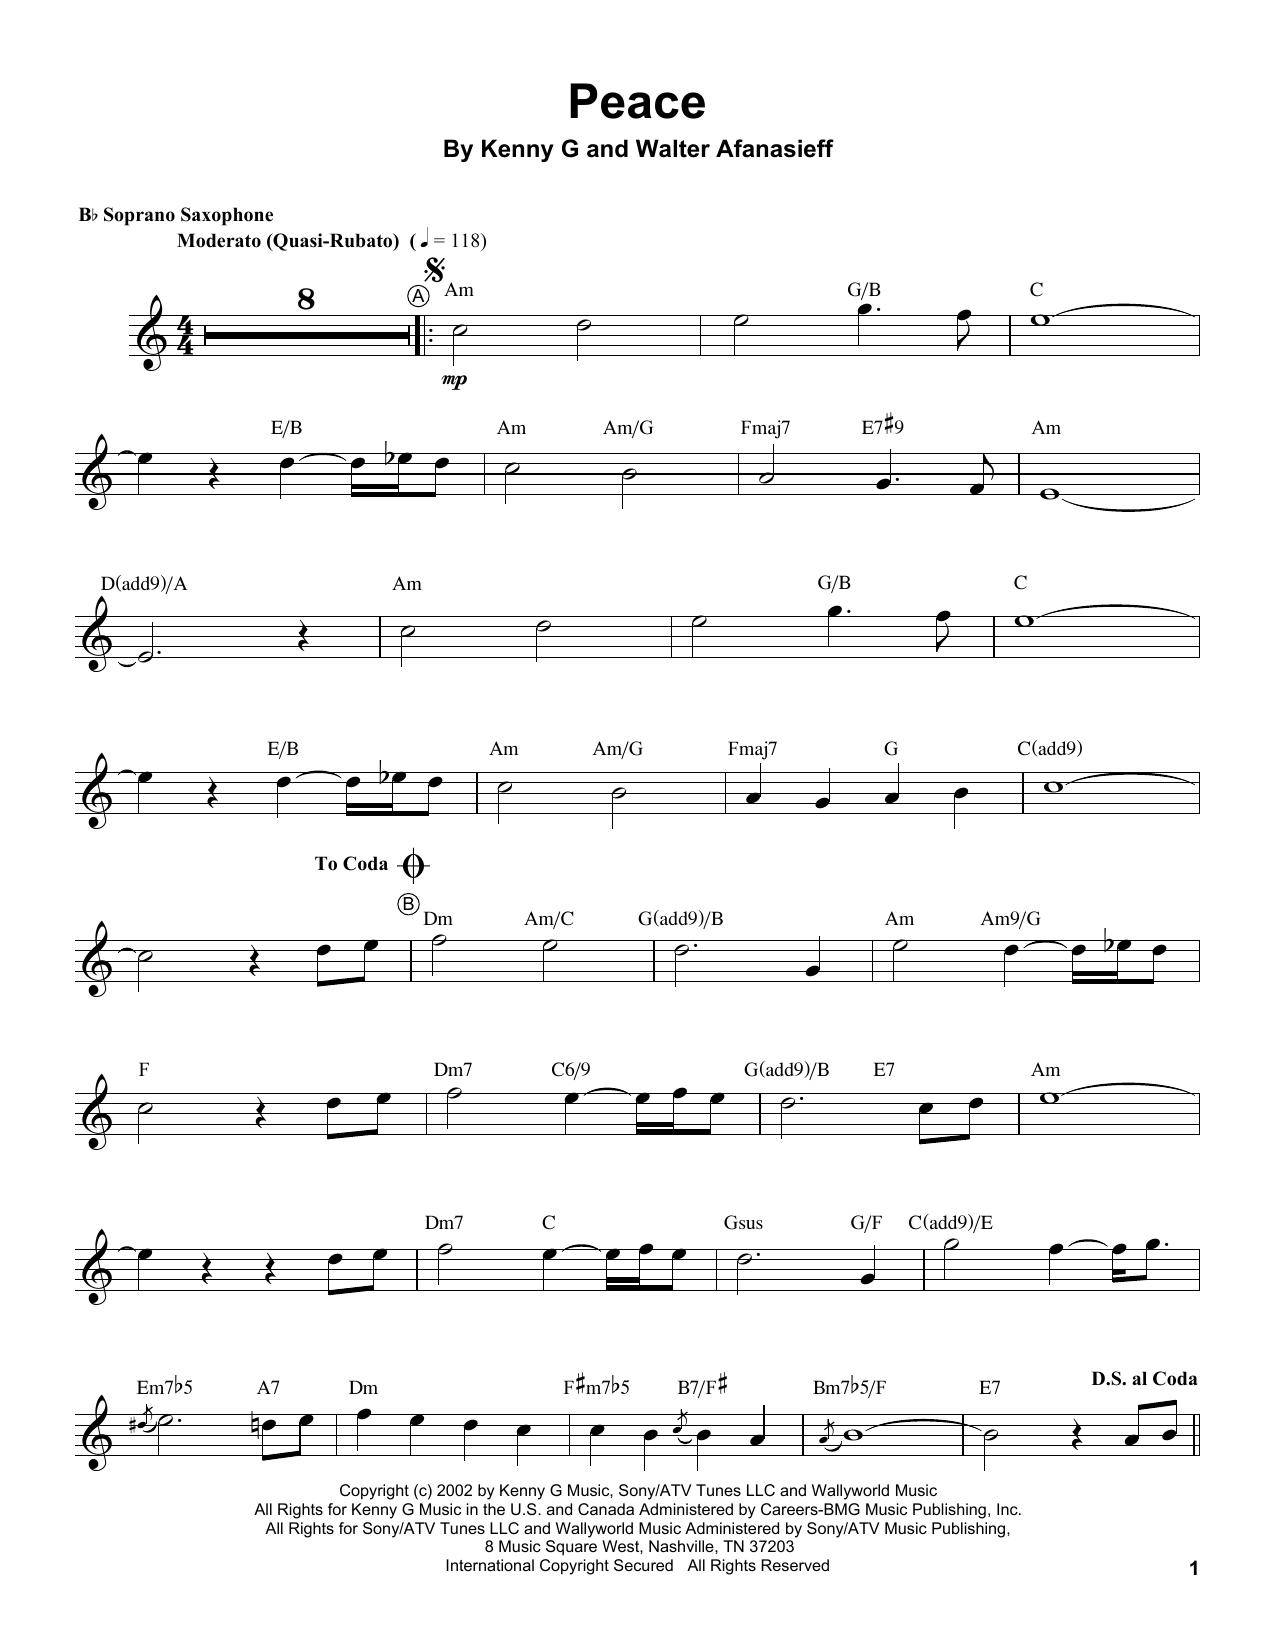 Sheet Music Digital Files To Print - Licensed Kenny G Digital Sheet ...